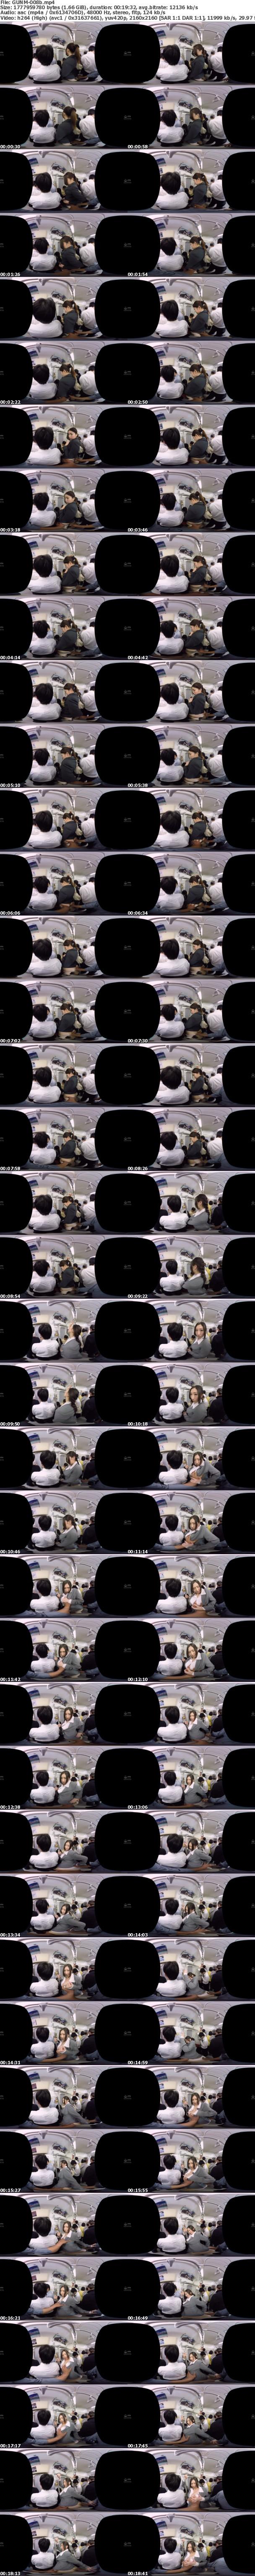 VR/3D GUNM-008 【VR】痴漢電車VR